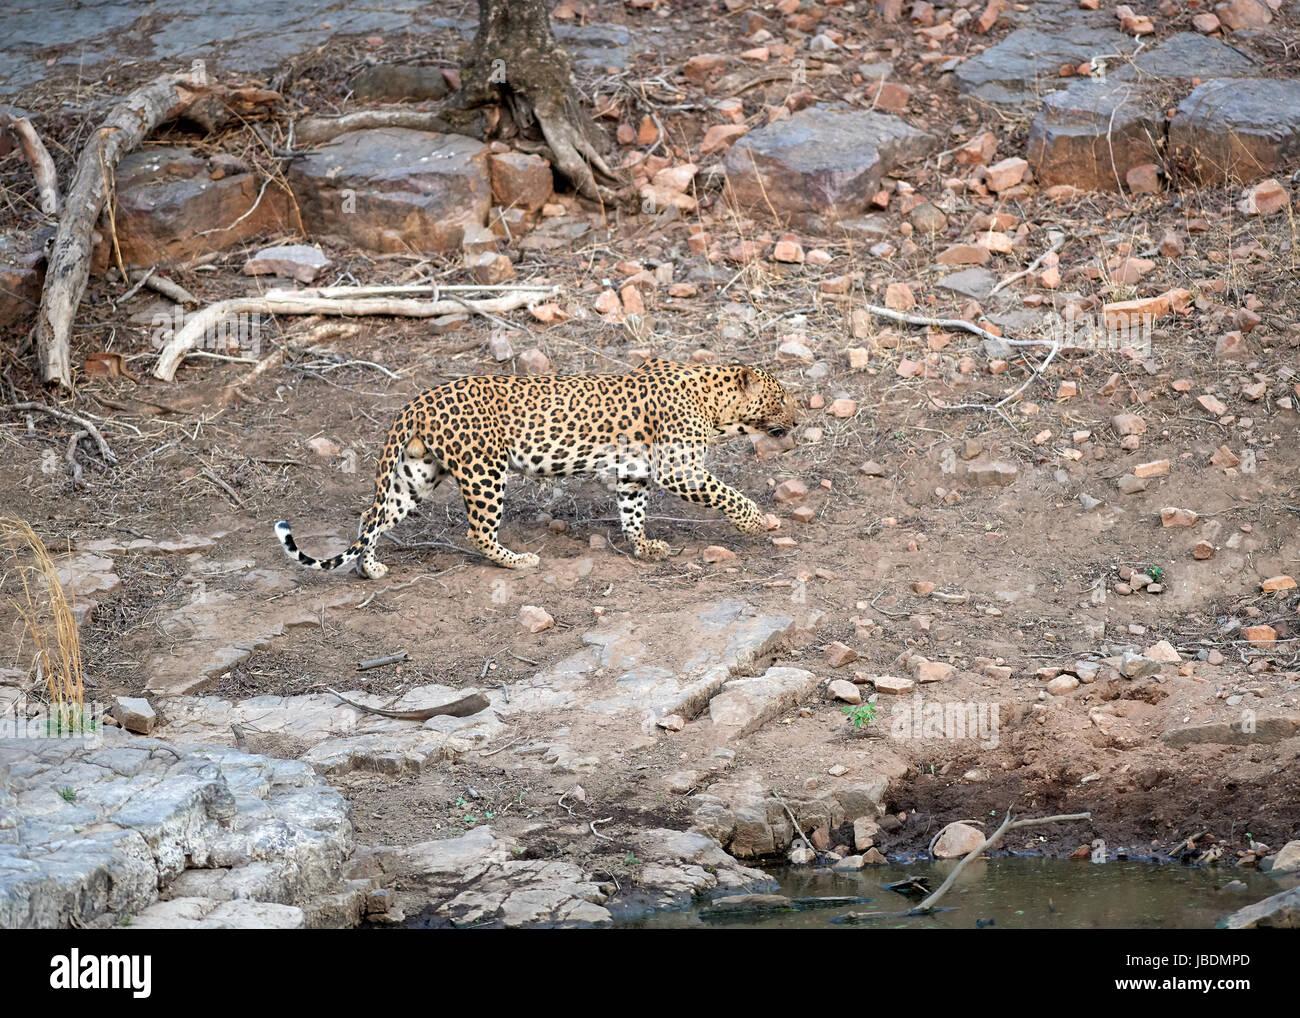 A male leopard walking away from its kill of a Sambar deer - Stock Image